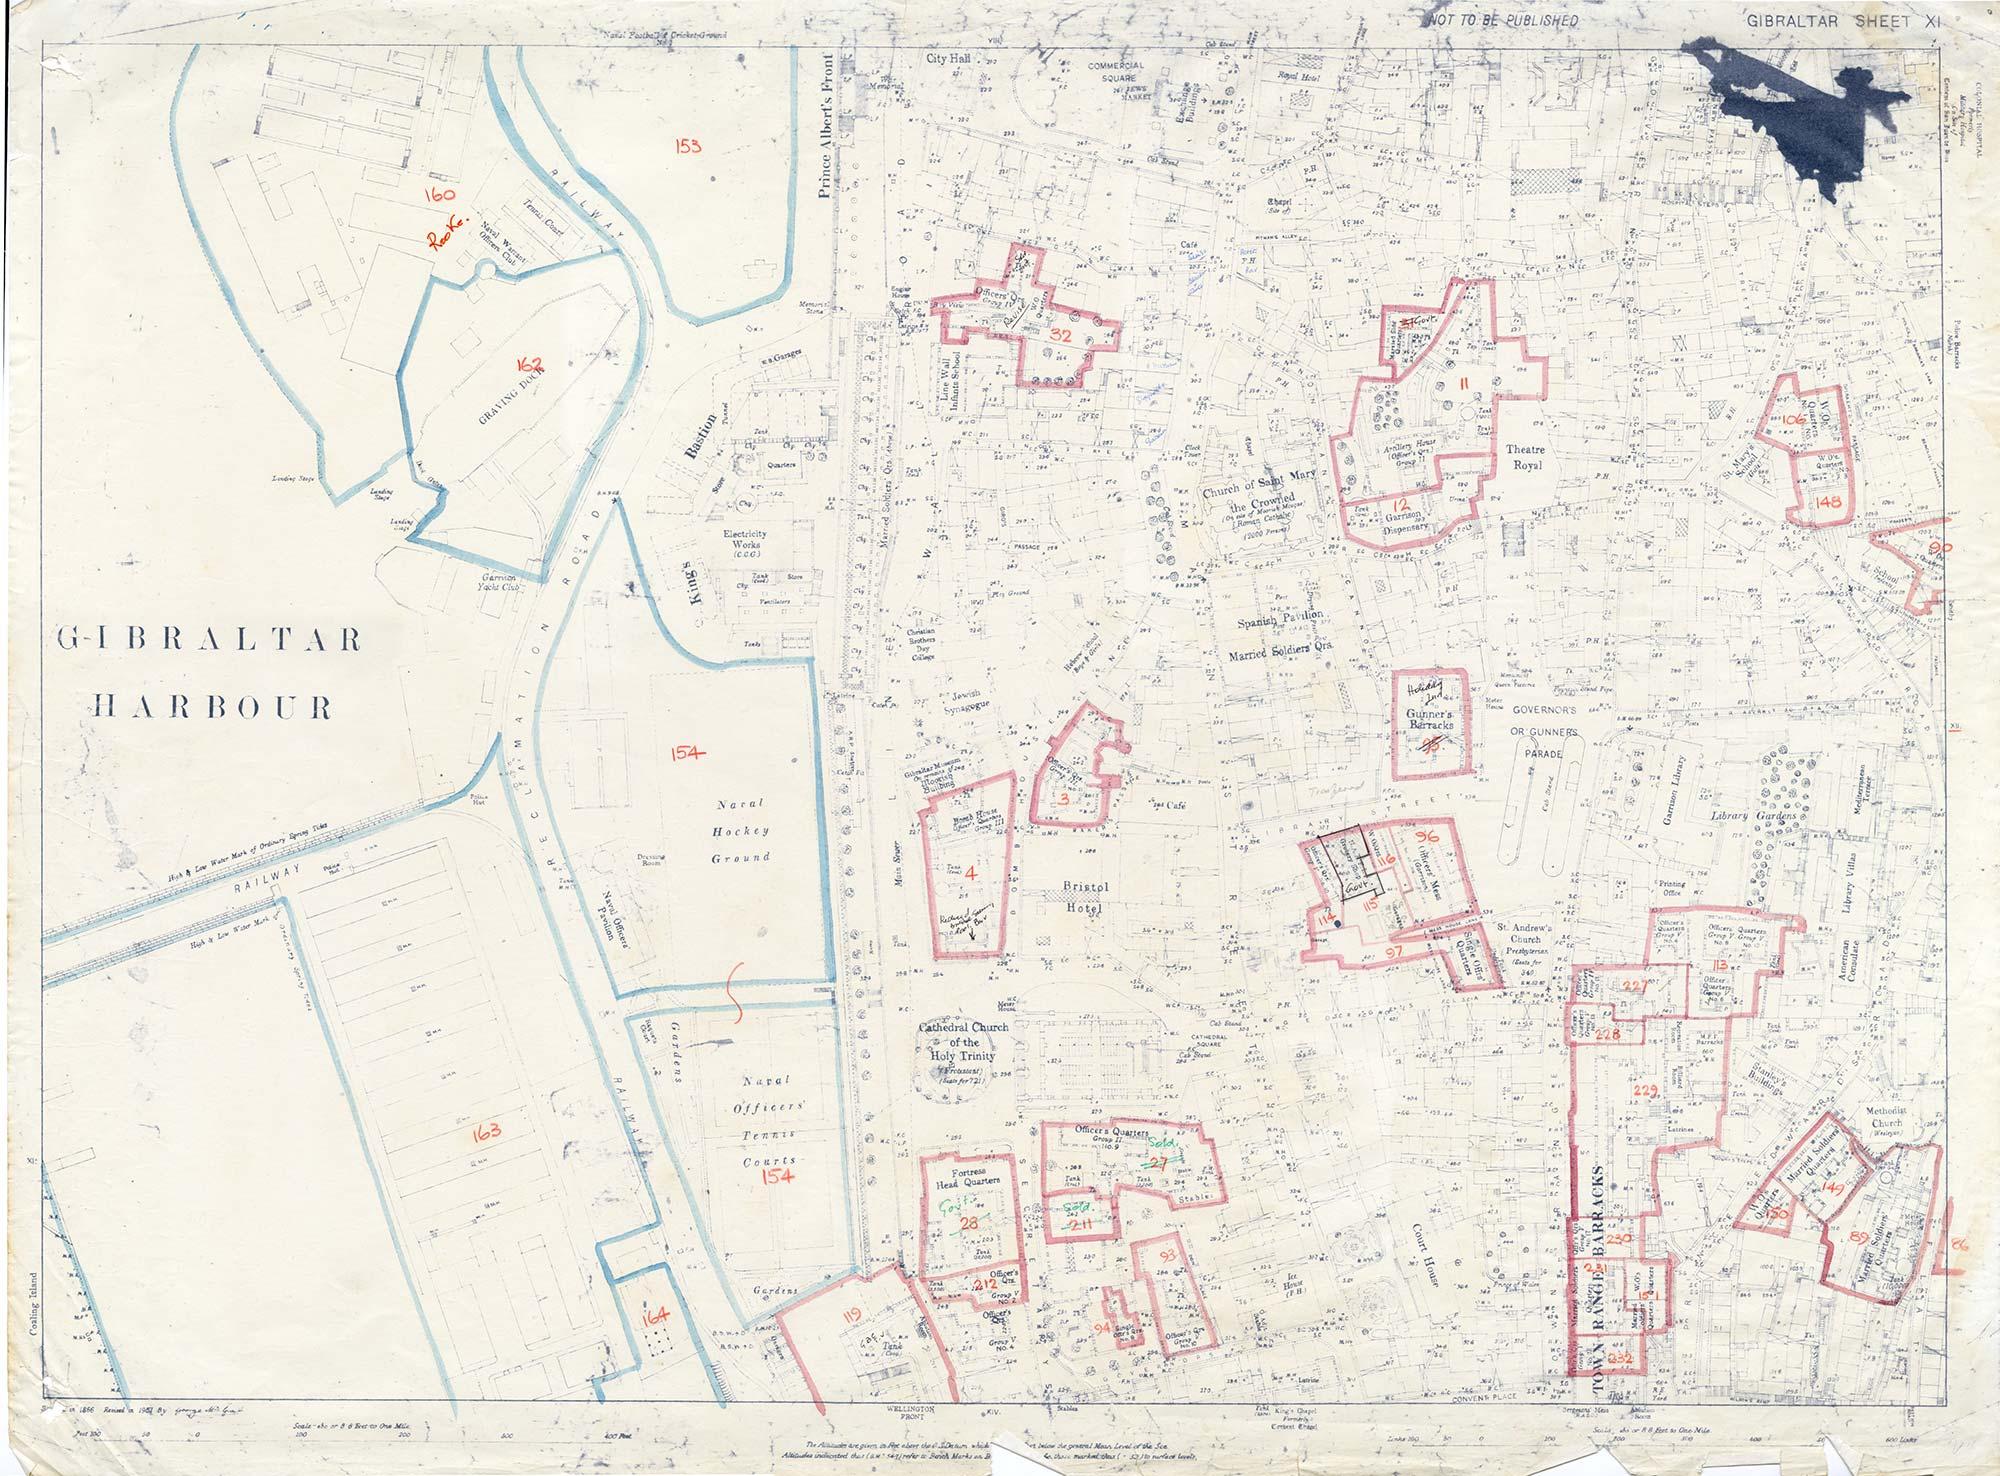 Map-11-OS-Sheet-11-Bristol-Hotel-Gibraltar-Harbour